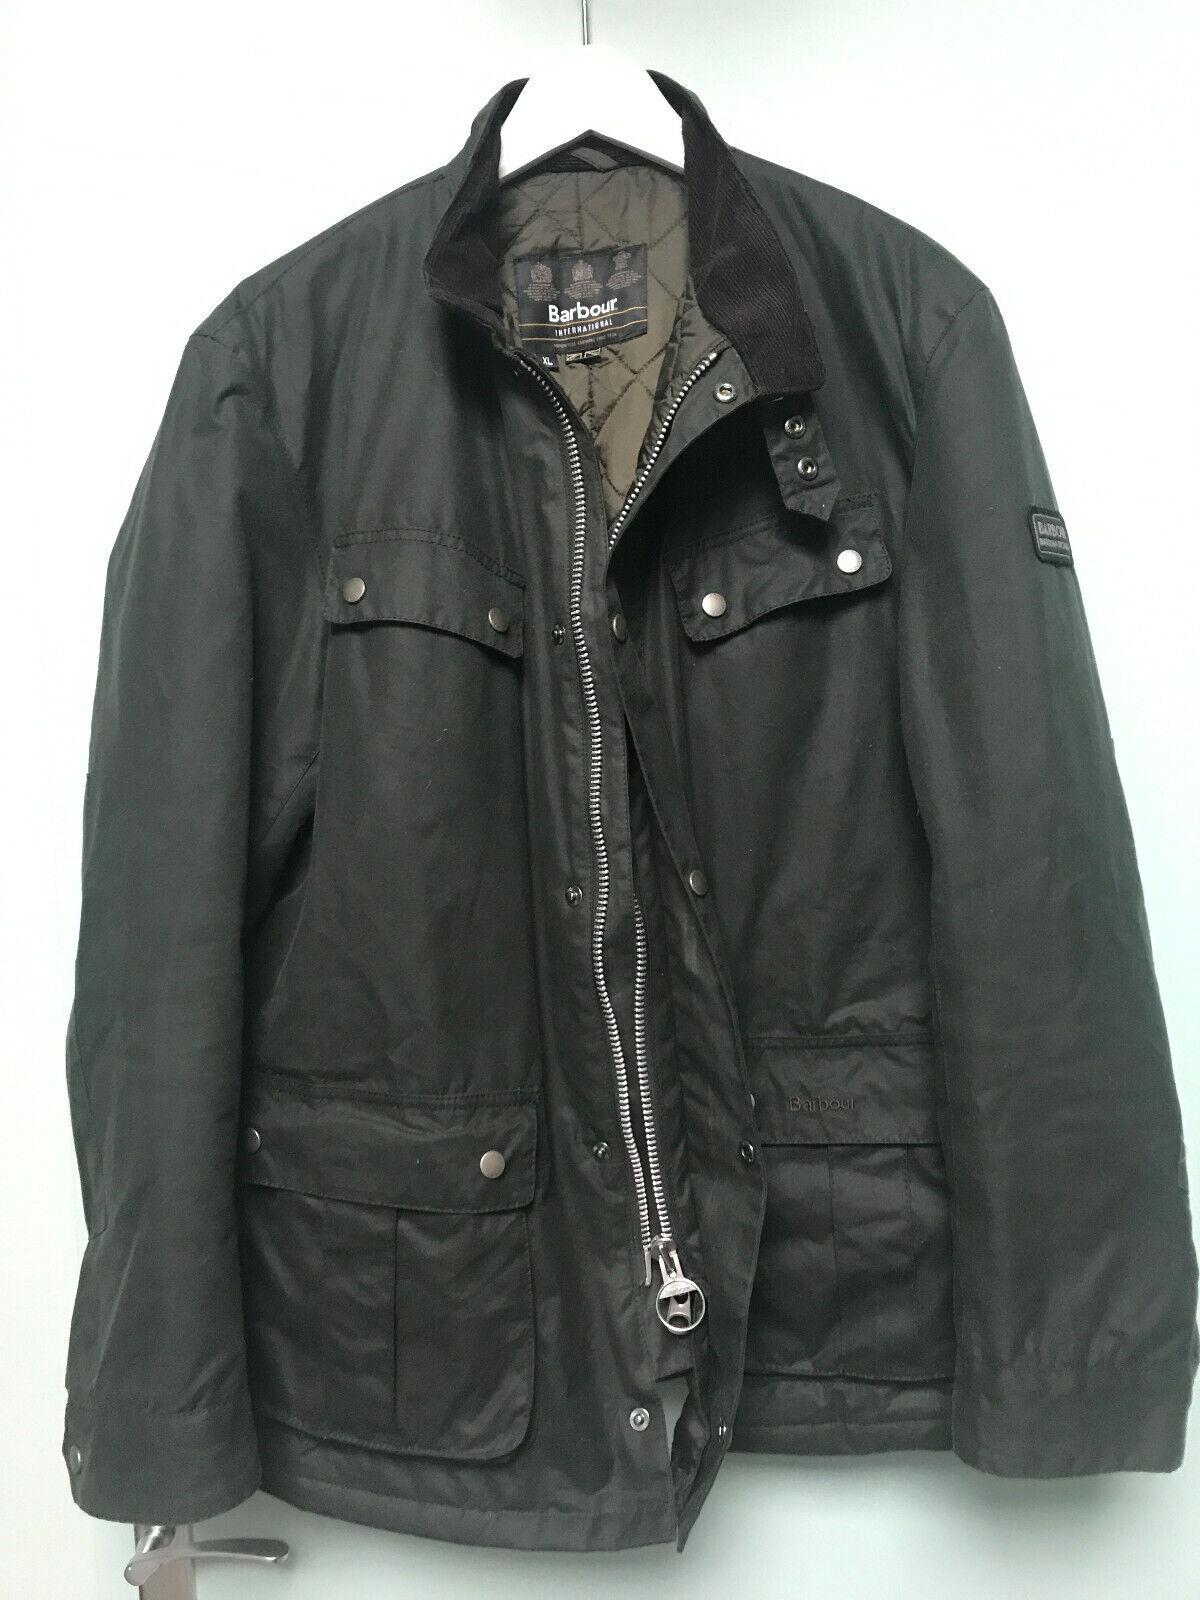 Veste barbour international duke wax jacket olive / kaki xl